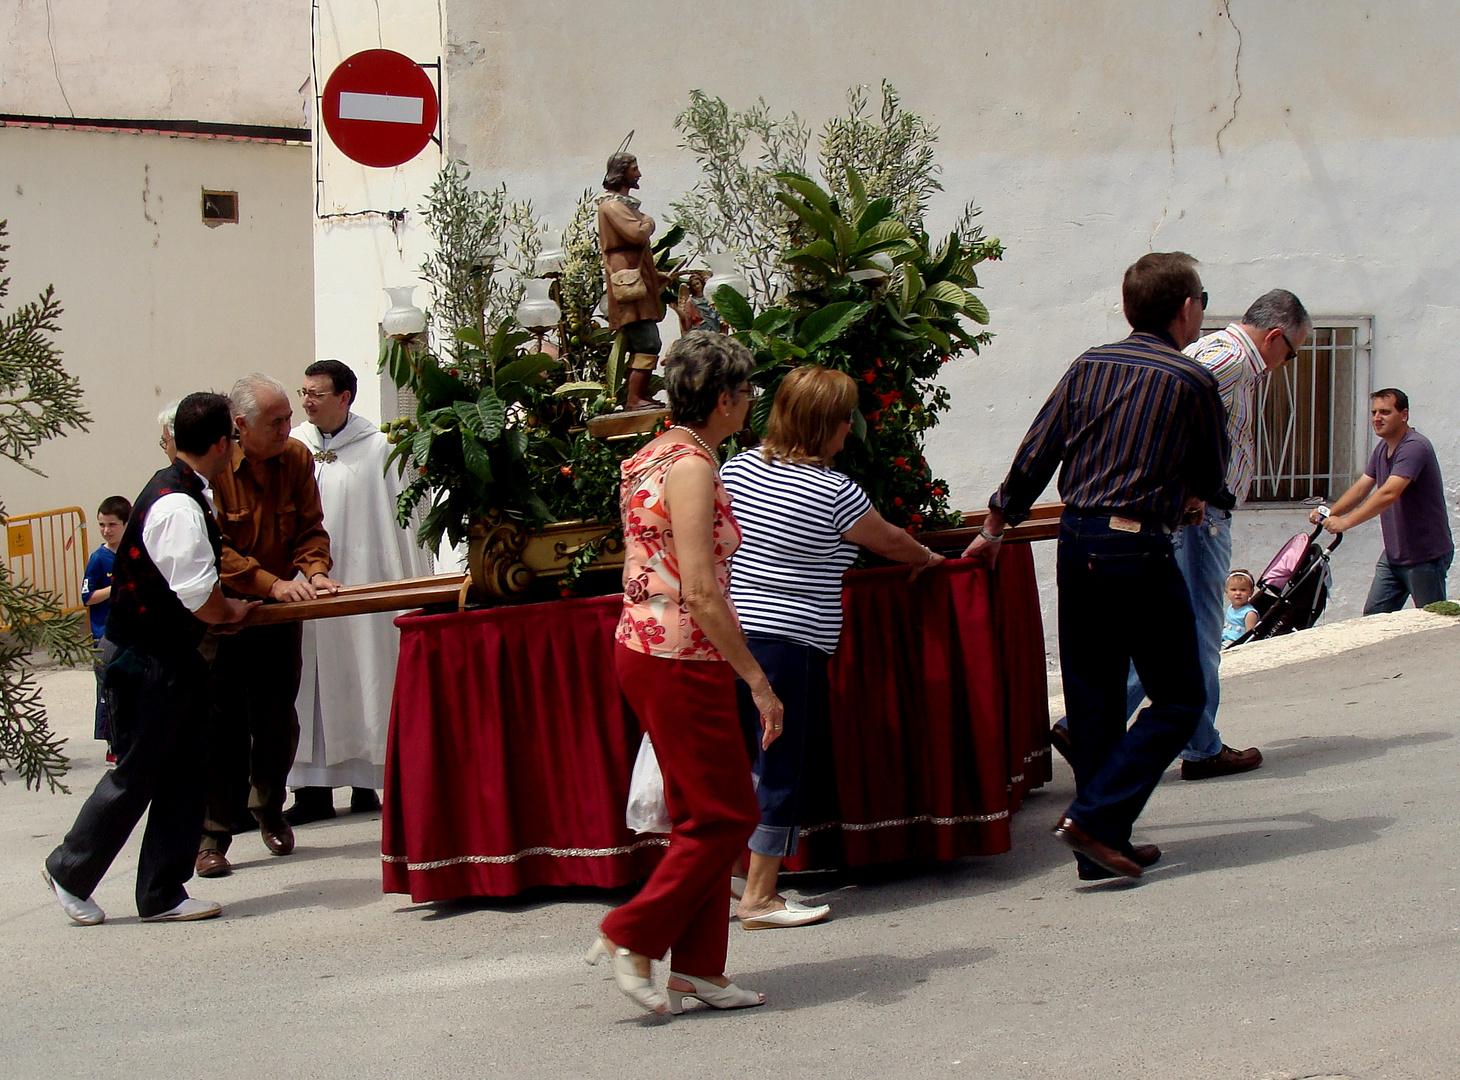 Calles et la fête de Sta. Quiteria..03